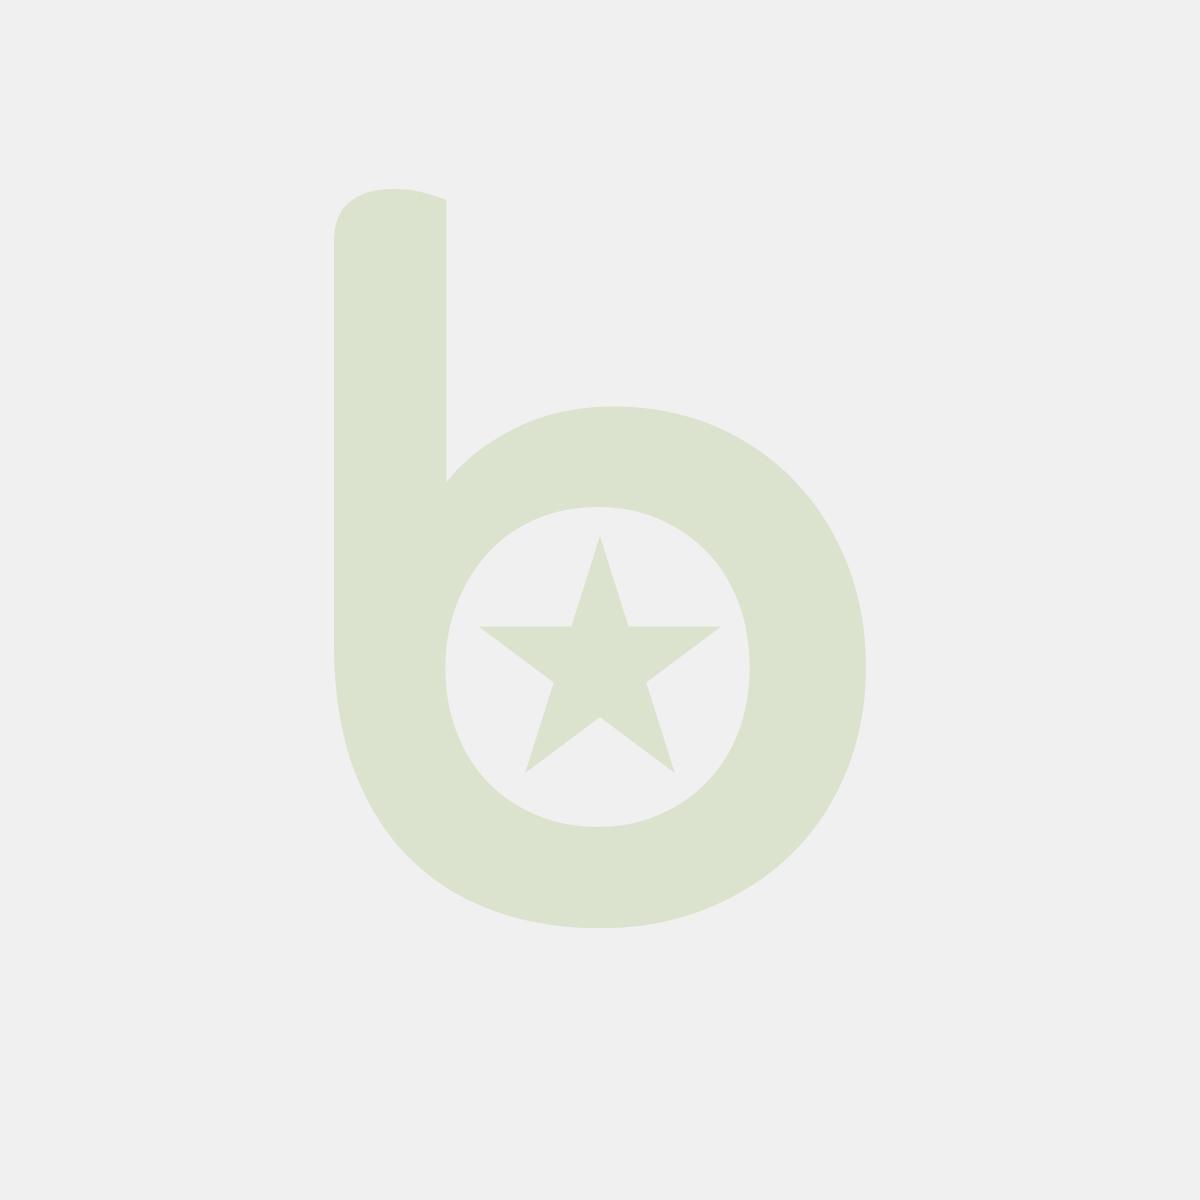 FINGERFOOD - taca 30x30x4cm, transparentna SAN